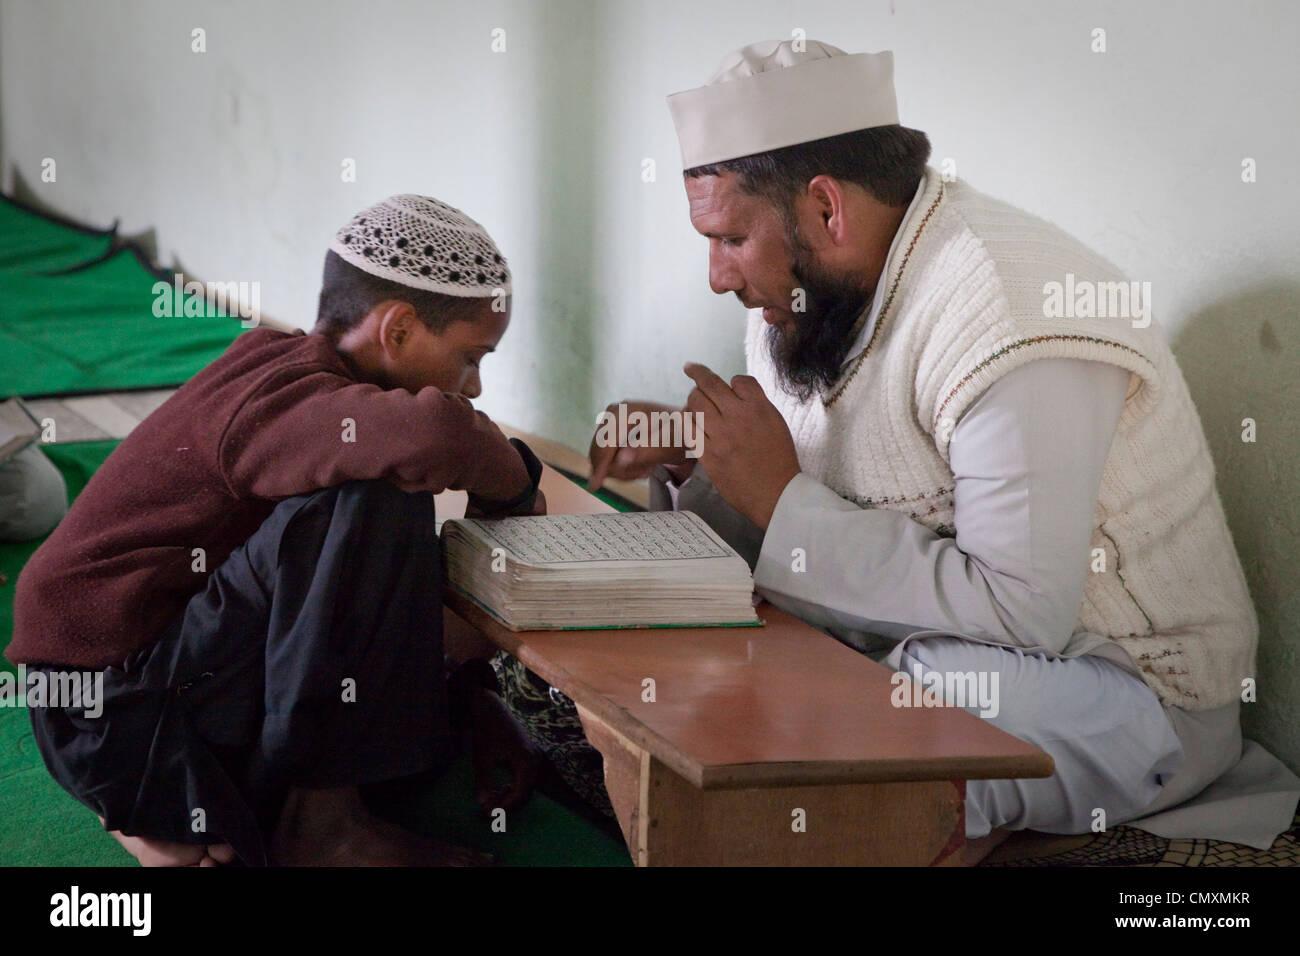 Imam Leads Madrasa Student through his Koranic Reading Lesson, Madrasa Imdadul Uloom, Dehradun, India. - Stock Image